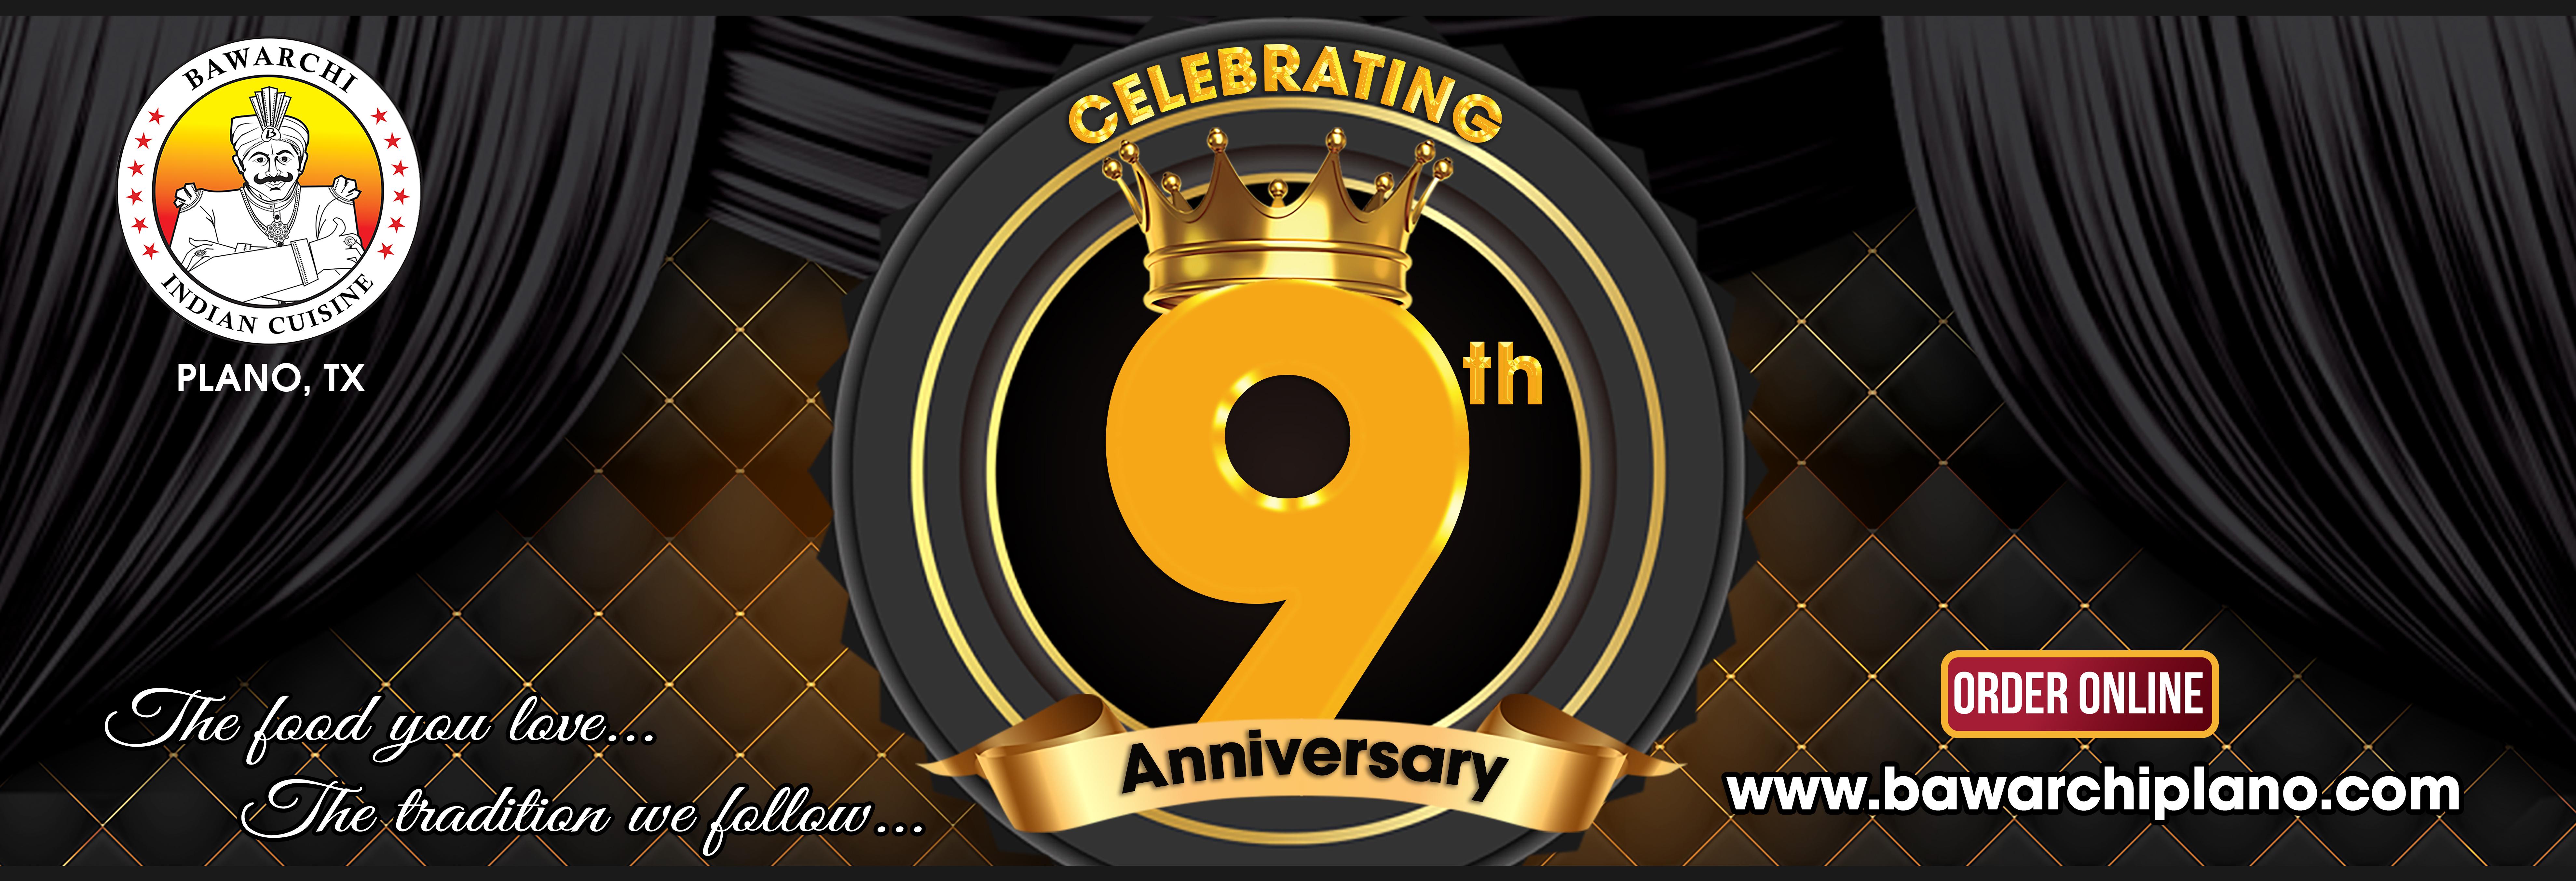 Bawarchi Plano TX 8th_Anniversary